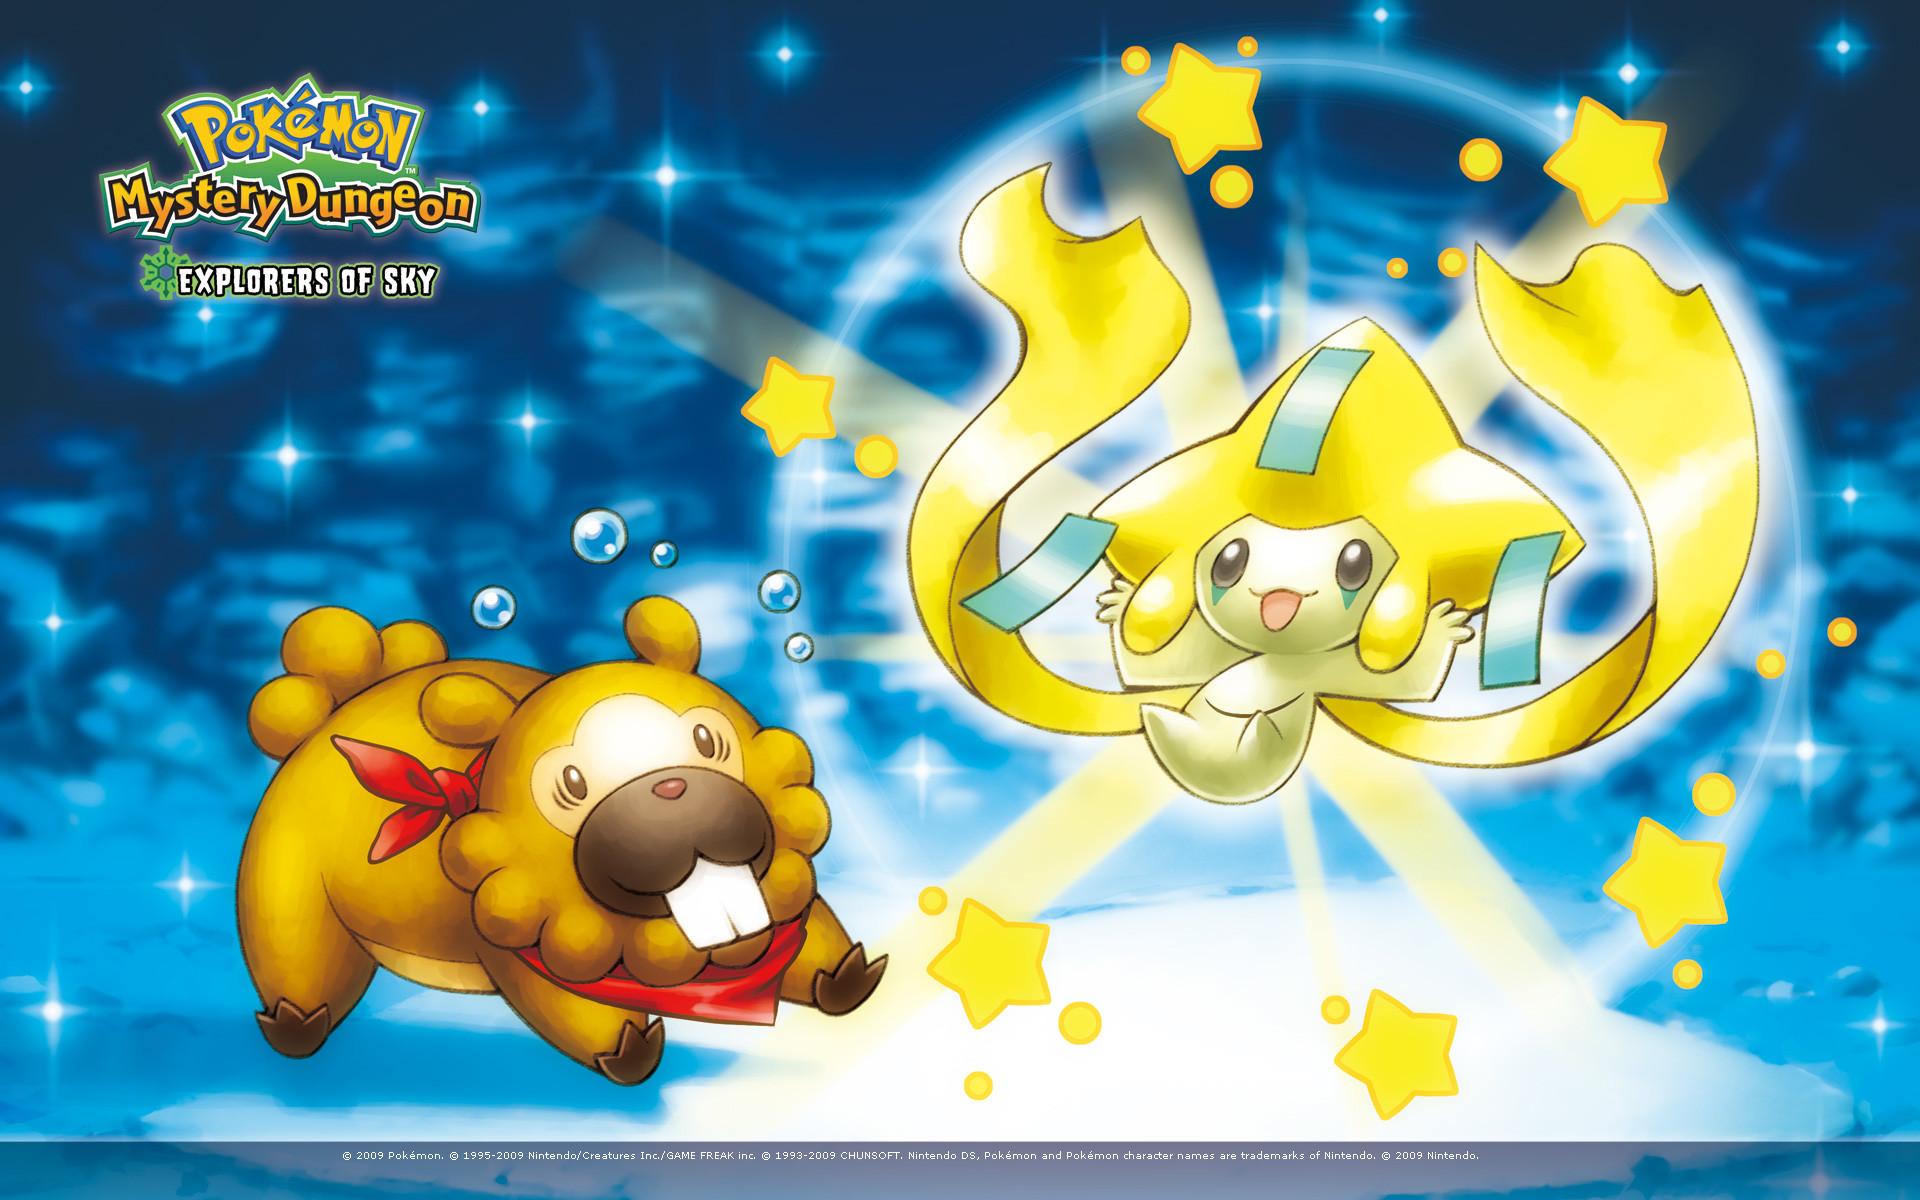 mysterydungeon3_wallpaper1_1920x1200.jpg (1920×1200) | Pokemon Mystery  Dungeon Sky | Pinterest | Pokémon